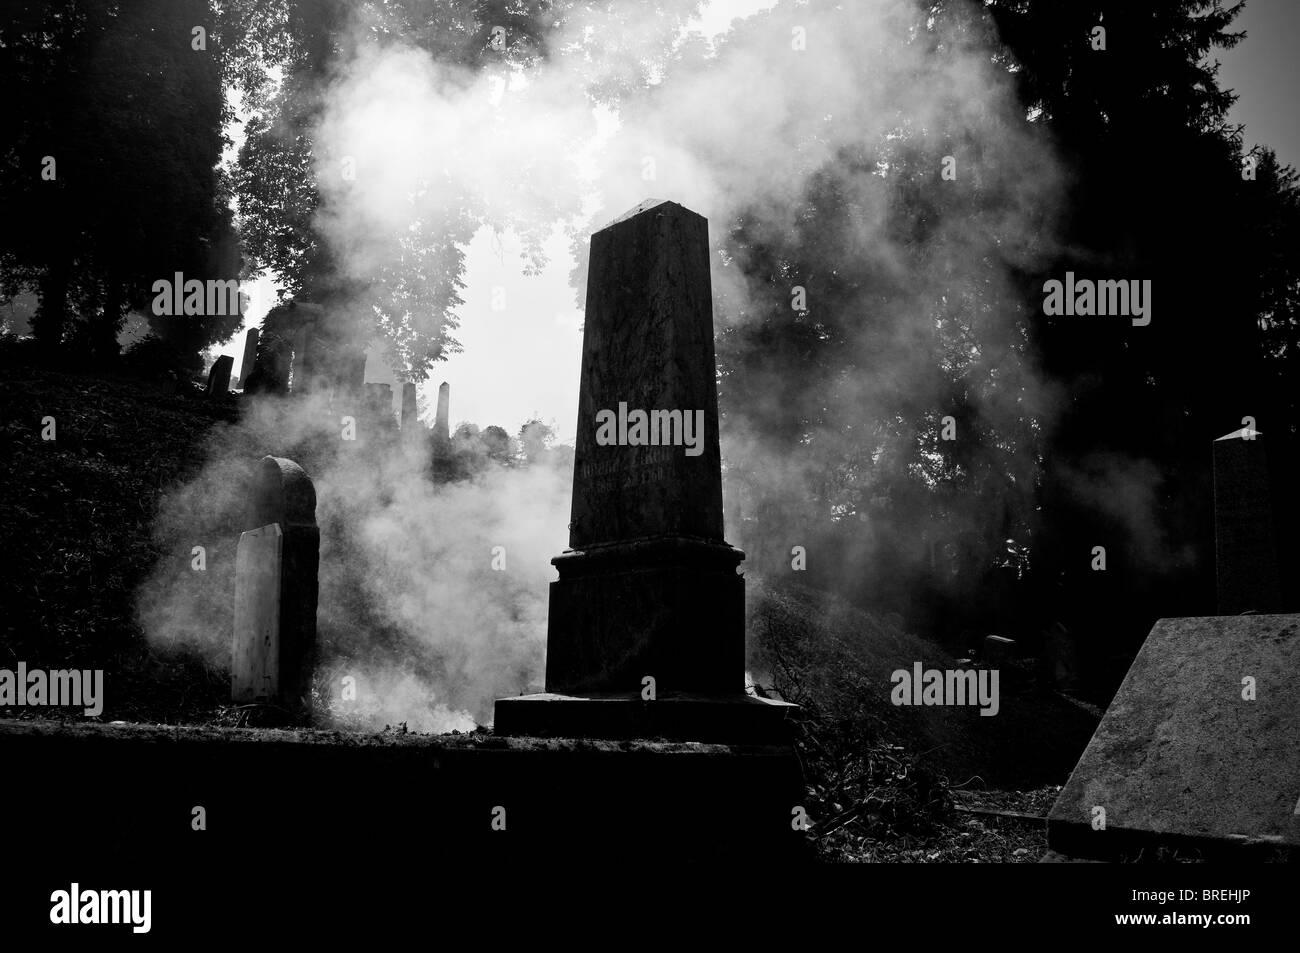 Transilvania, Romania . Sighişoara. Cemetery. Fog among the graves - Stock Image